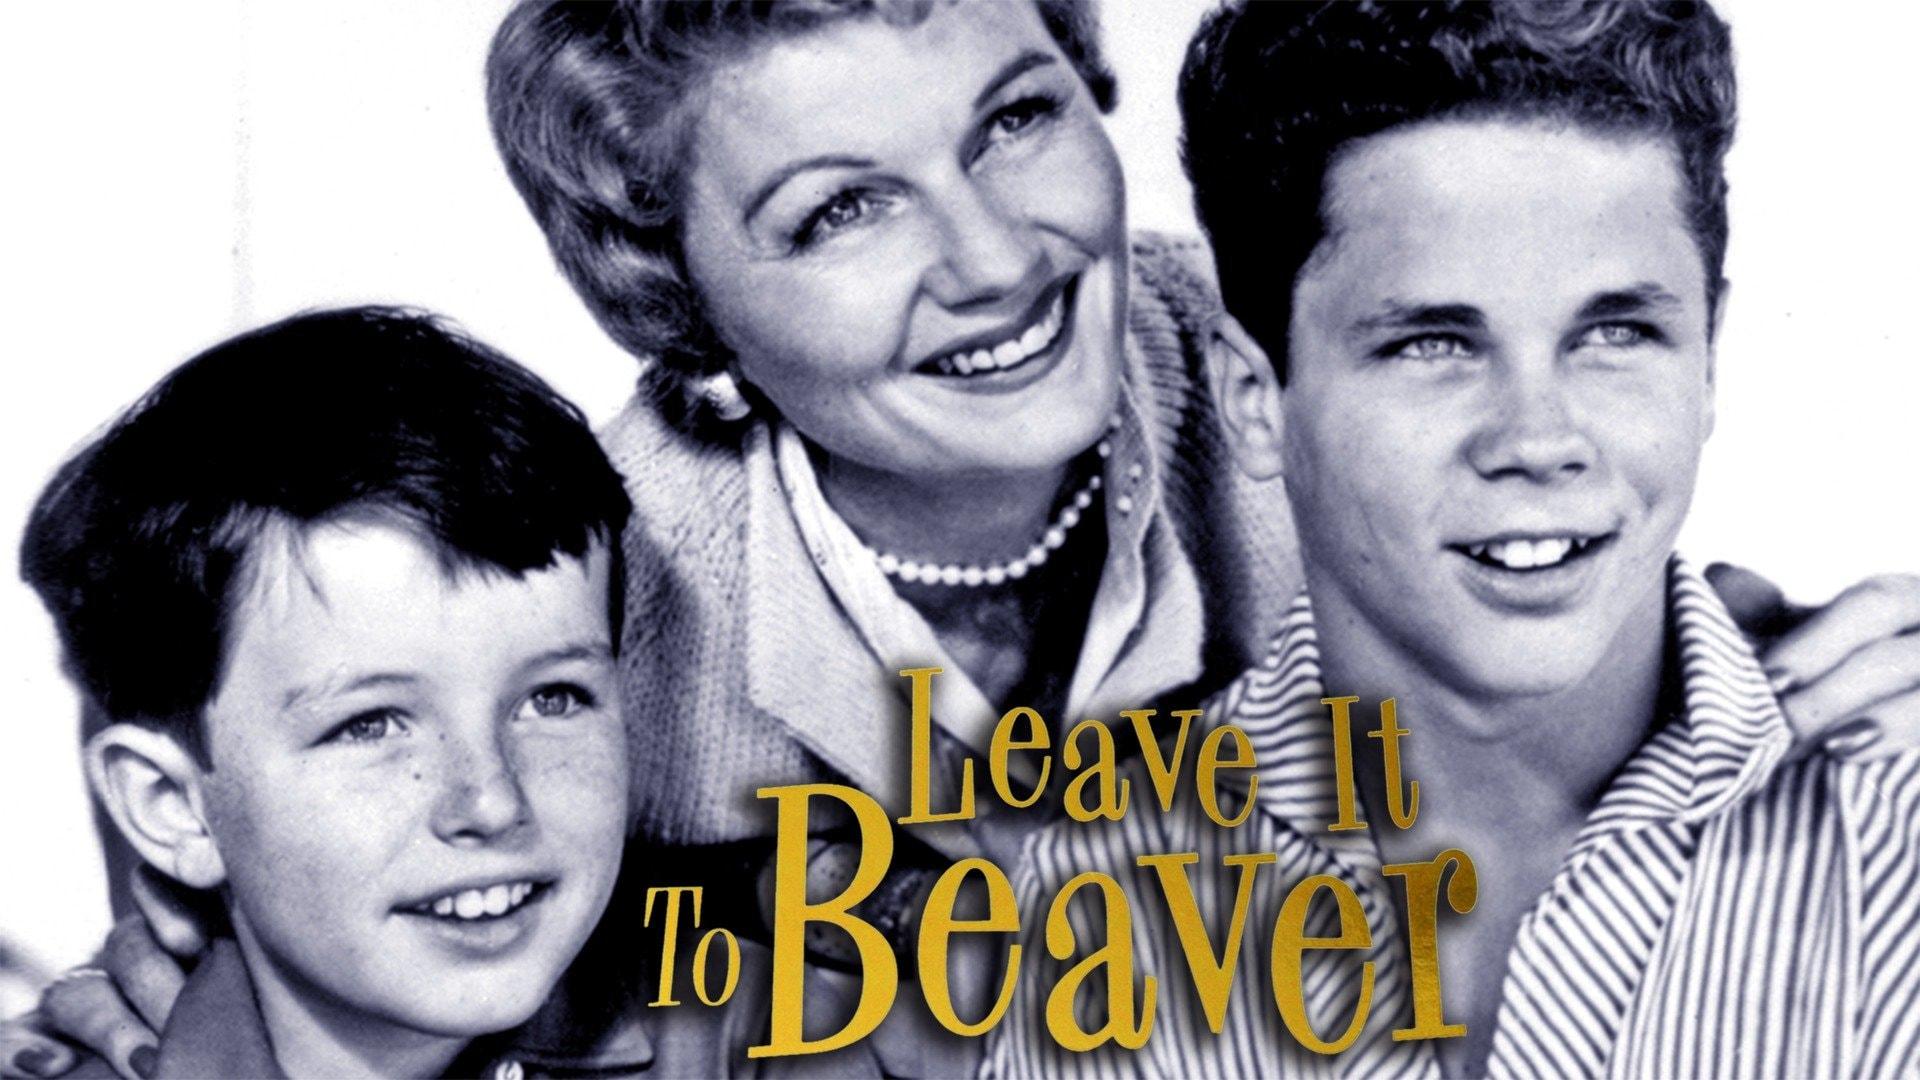 Beaver's Old Buddy